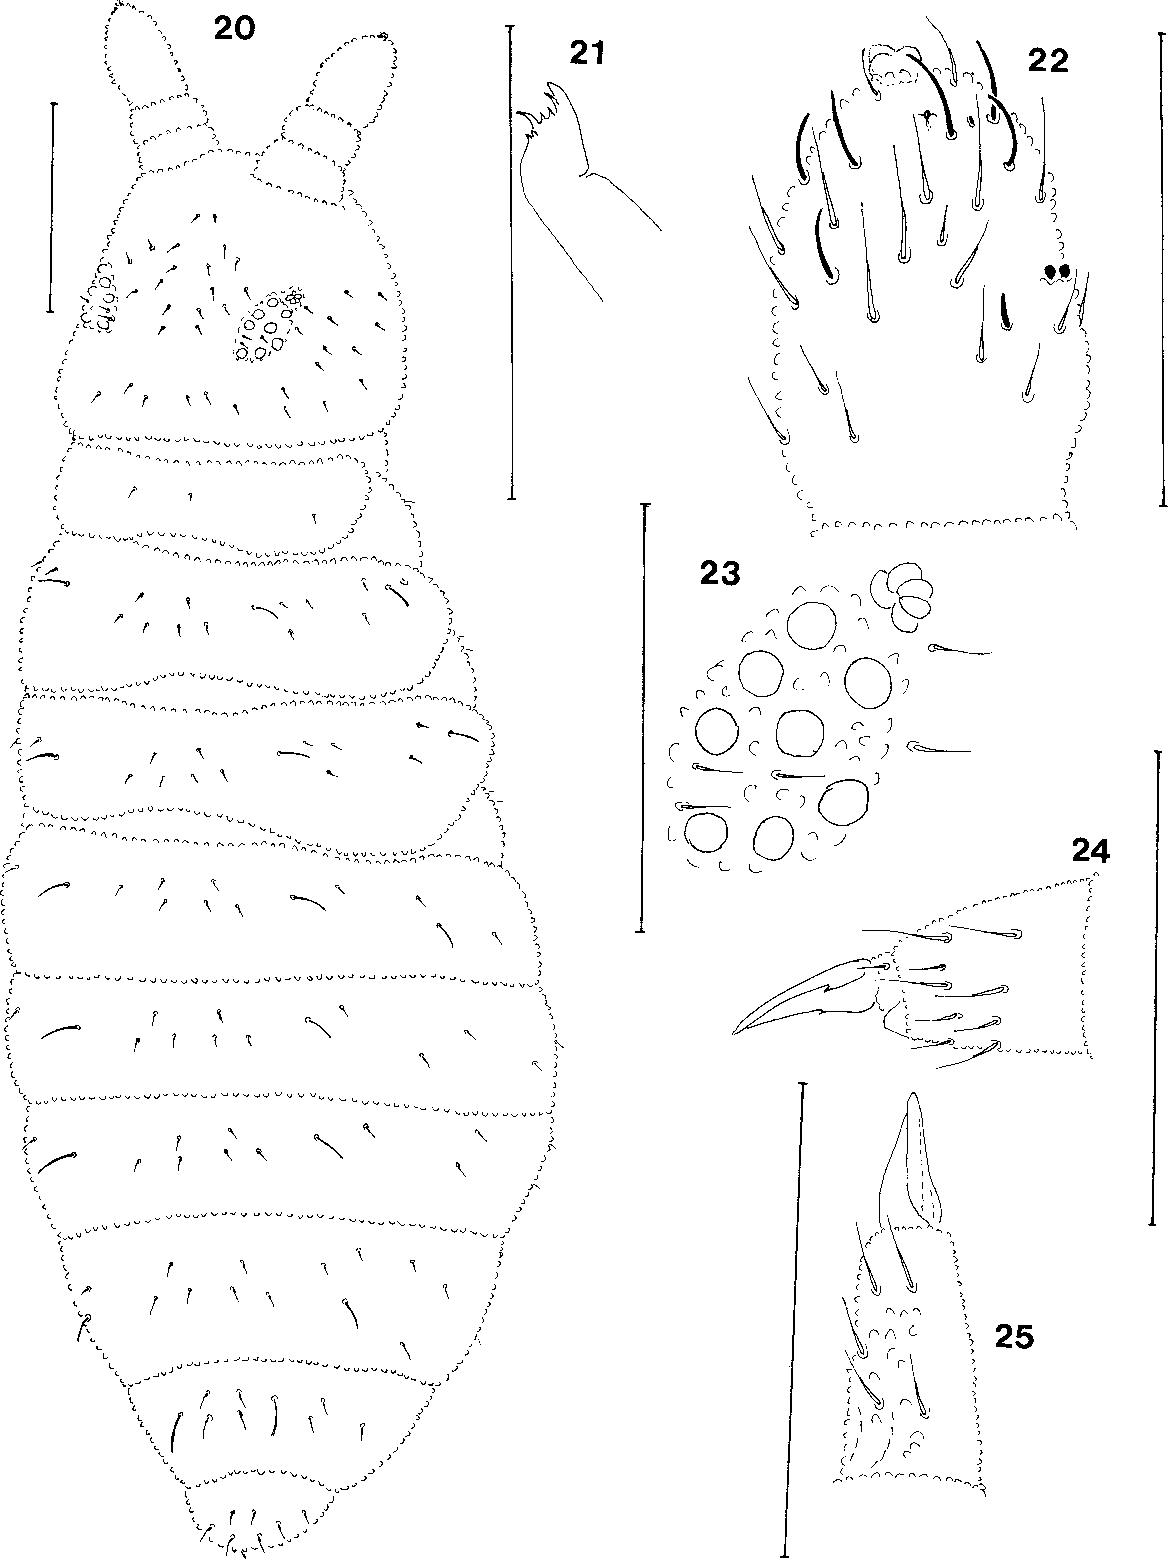 figure 20-25